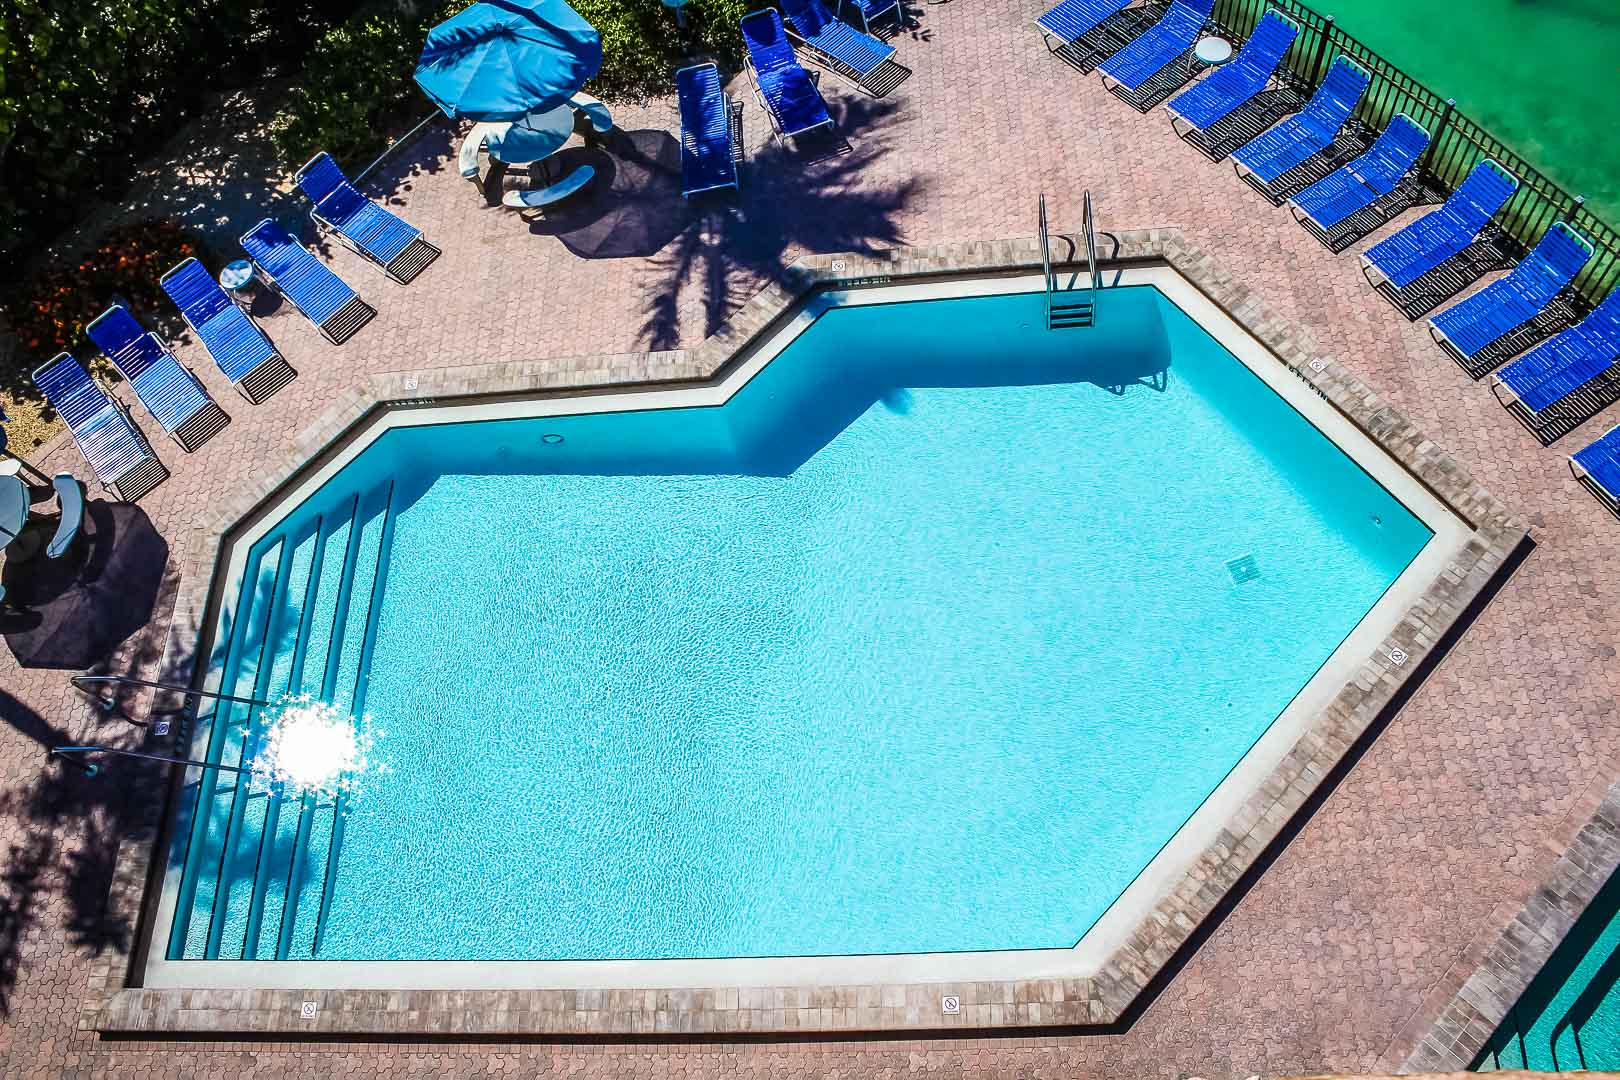 A spacious outdoor swimming pool at VRI's Bonita Resort and Club in Florida.